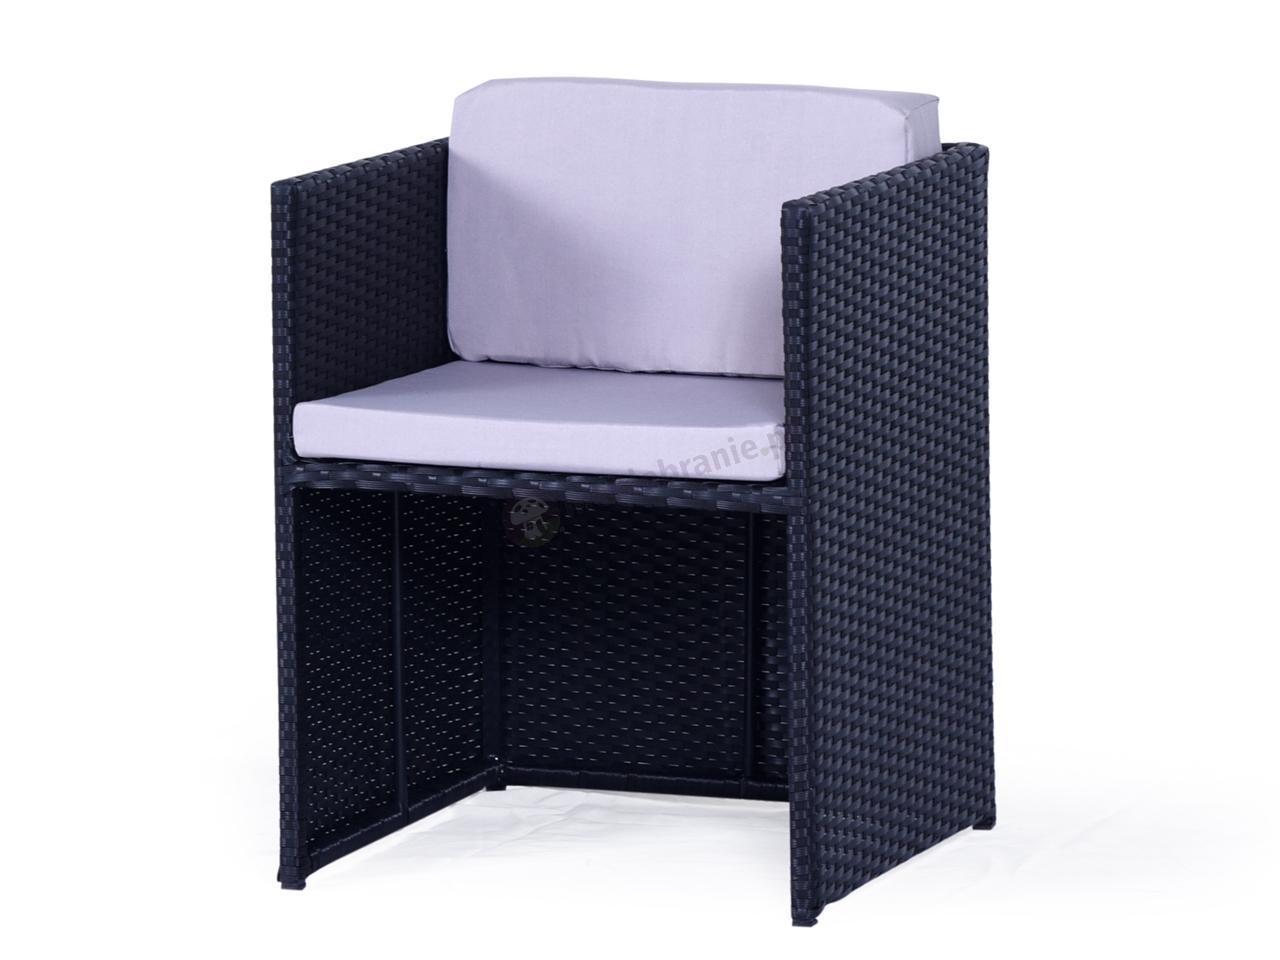 Fotel z technorattanu Cubioso Black Along & Taupe